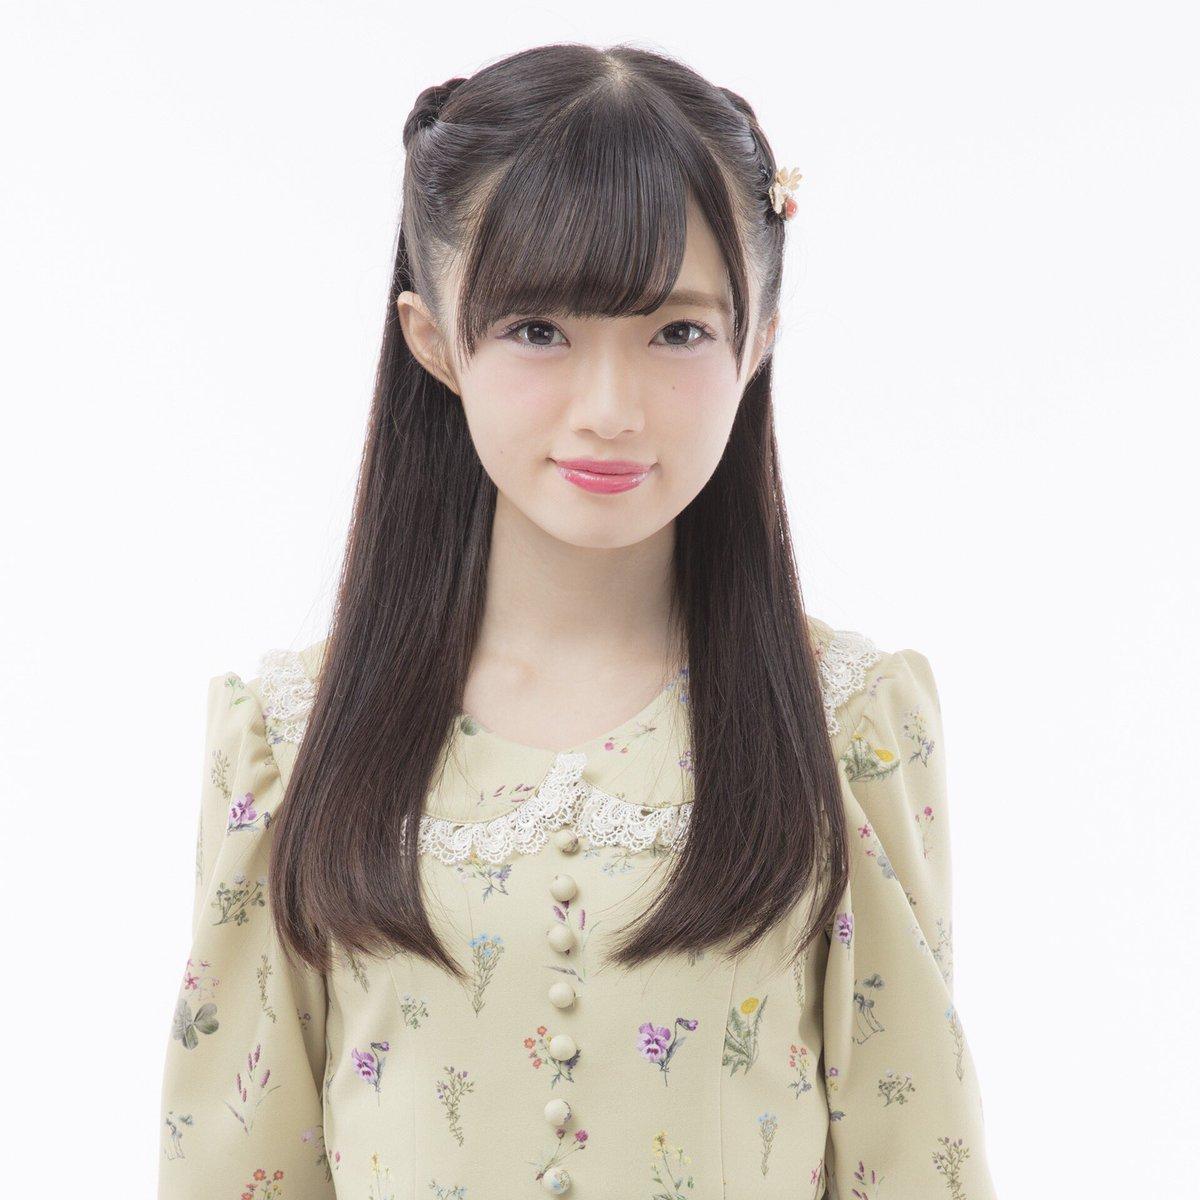 【NGT48】「炎上アイドル」中井りか、「文春砲」完全否定&アンチに反論「同棲なんてしてないです!残念でした〜」